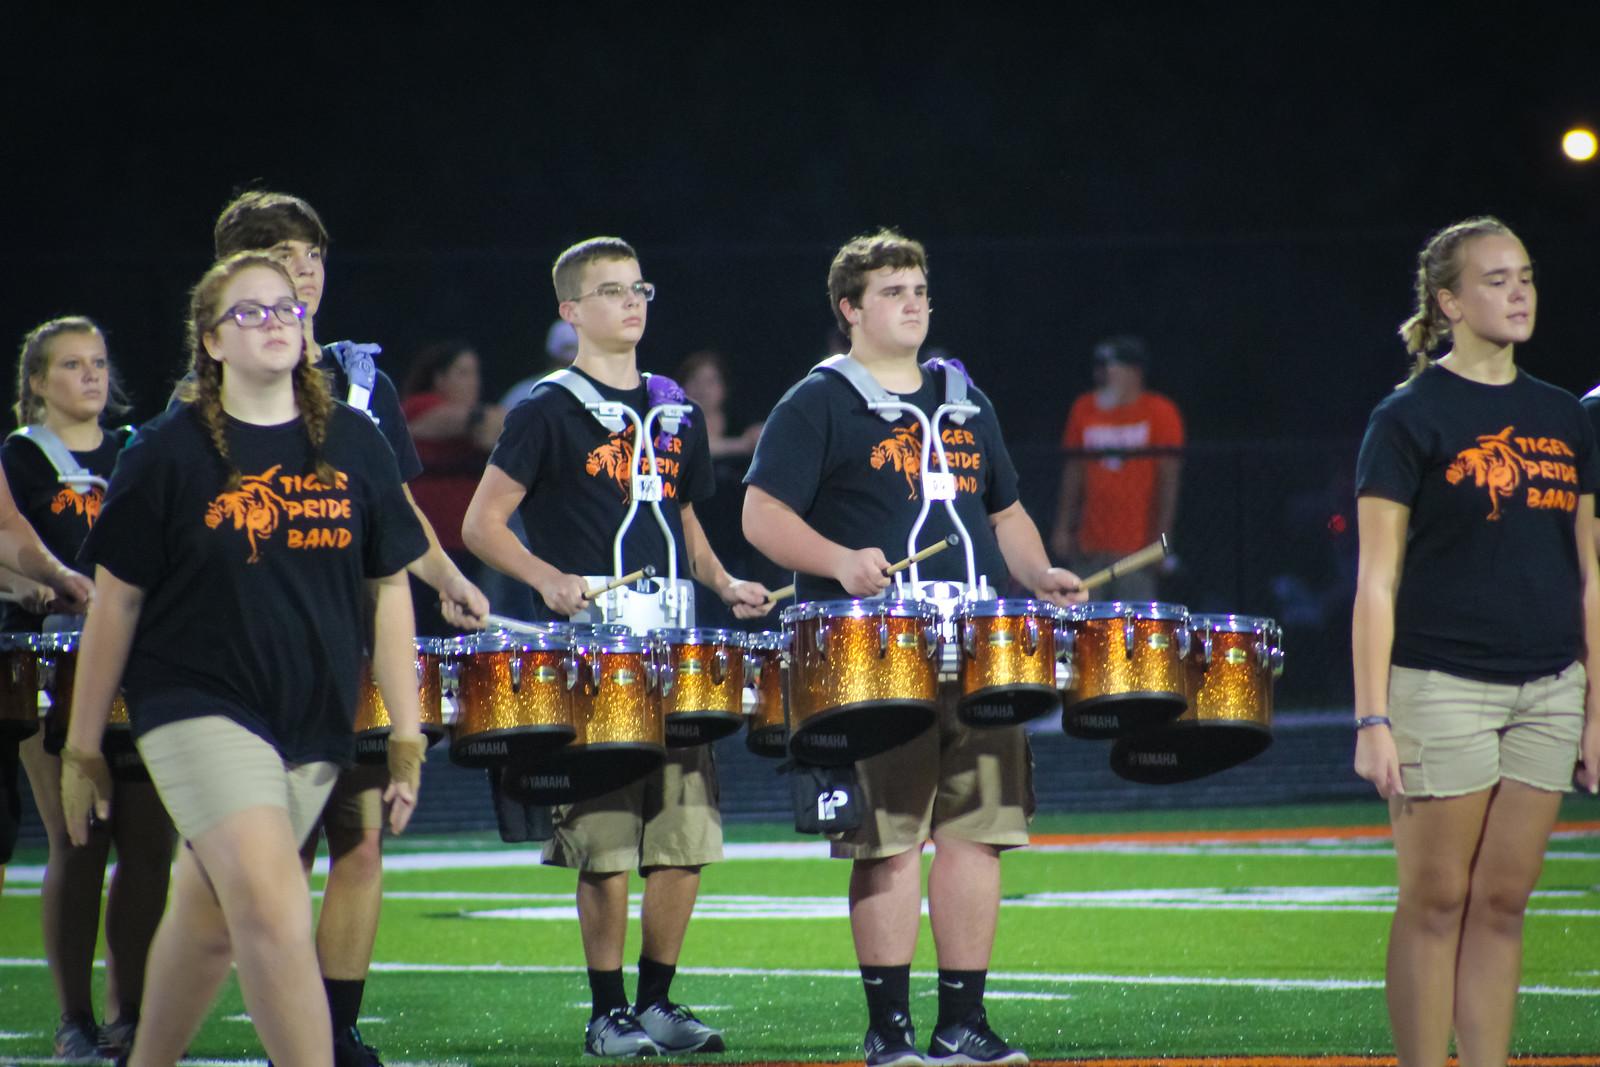 Off The Field: Tiger Pride Band – Halftime Vs Branson